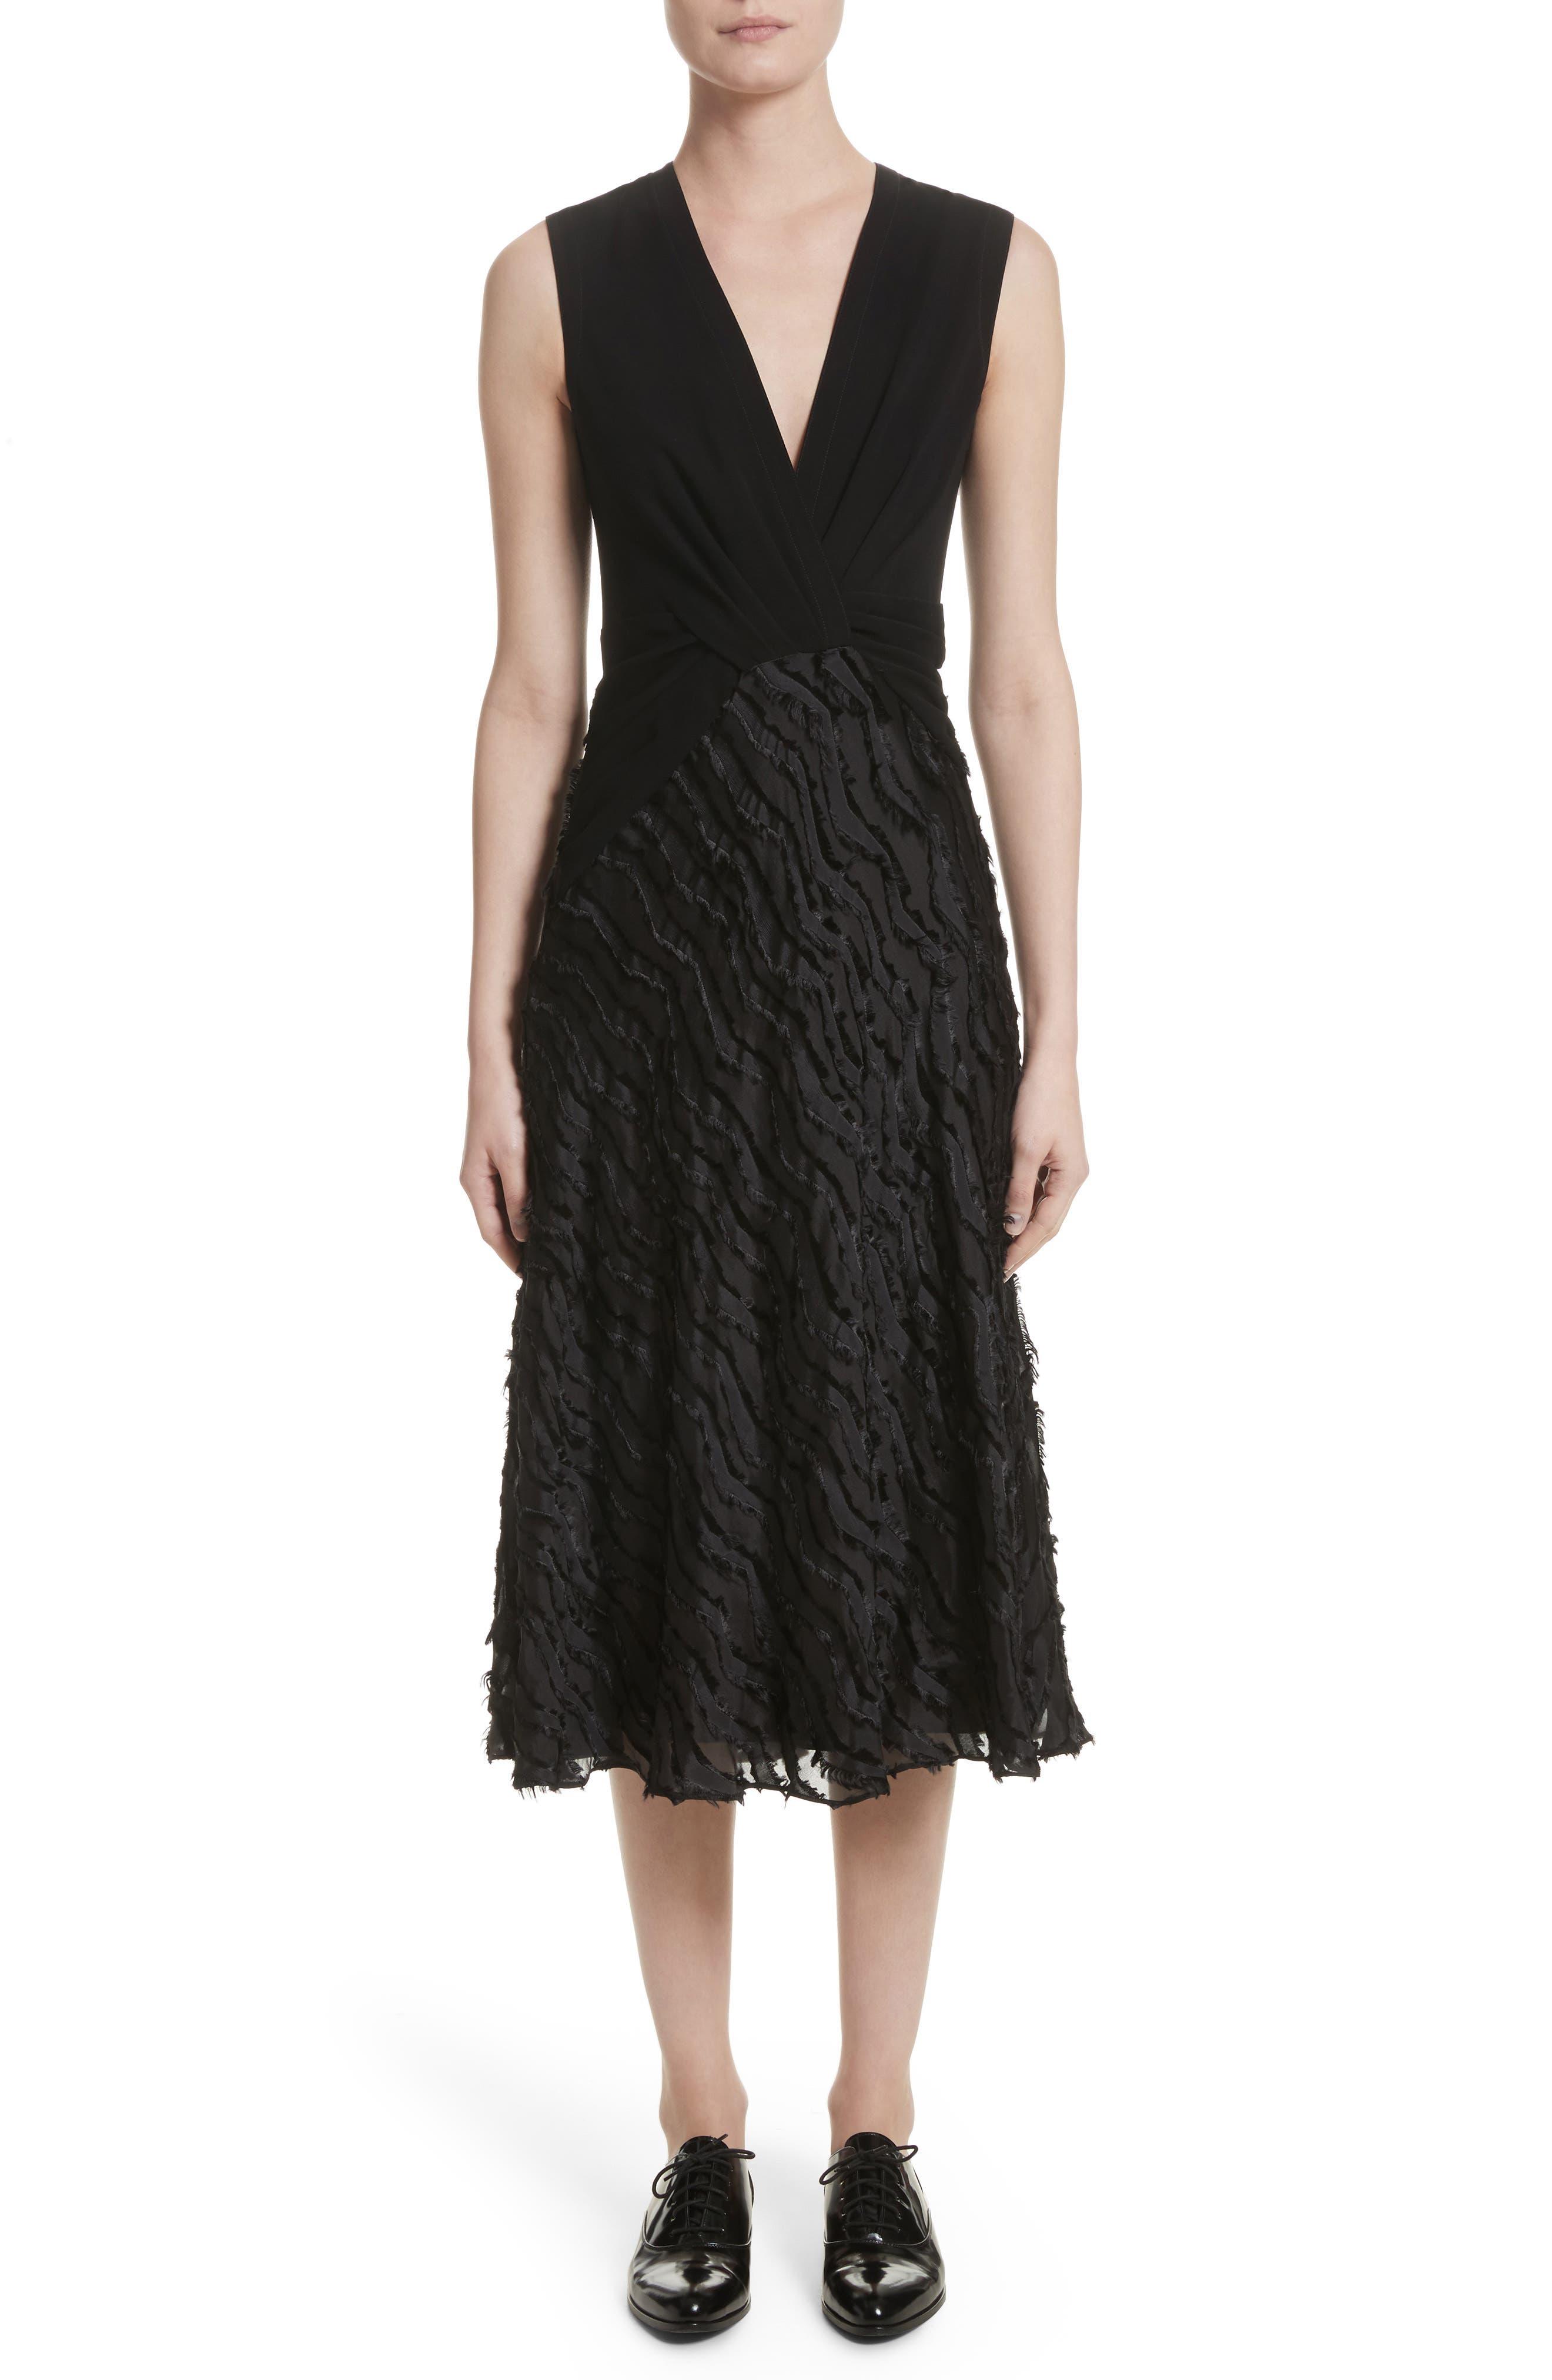 YIGAL AZROUËL Chevron Fringe Fil Coupé Dress